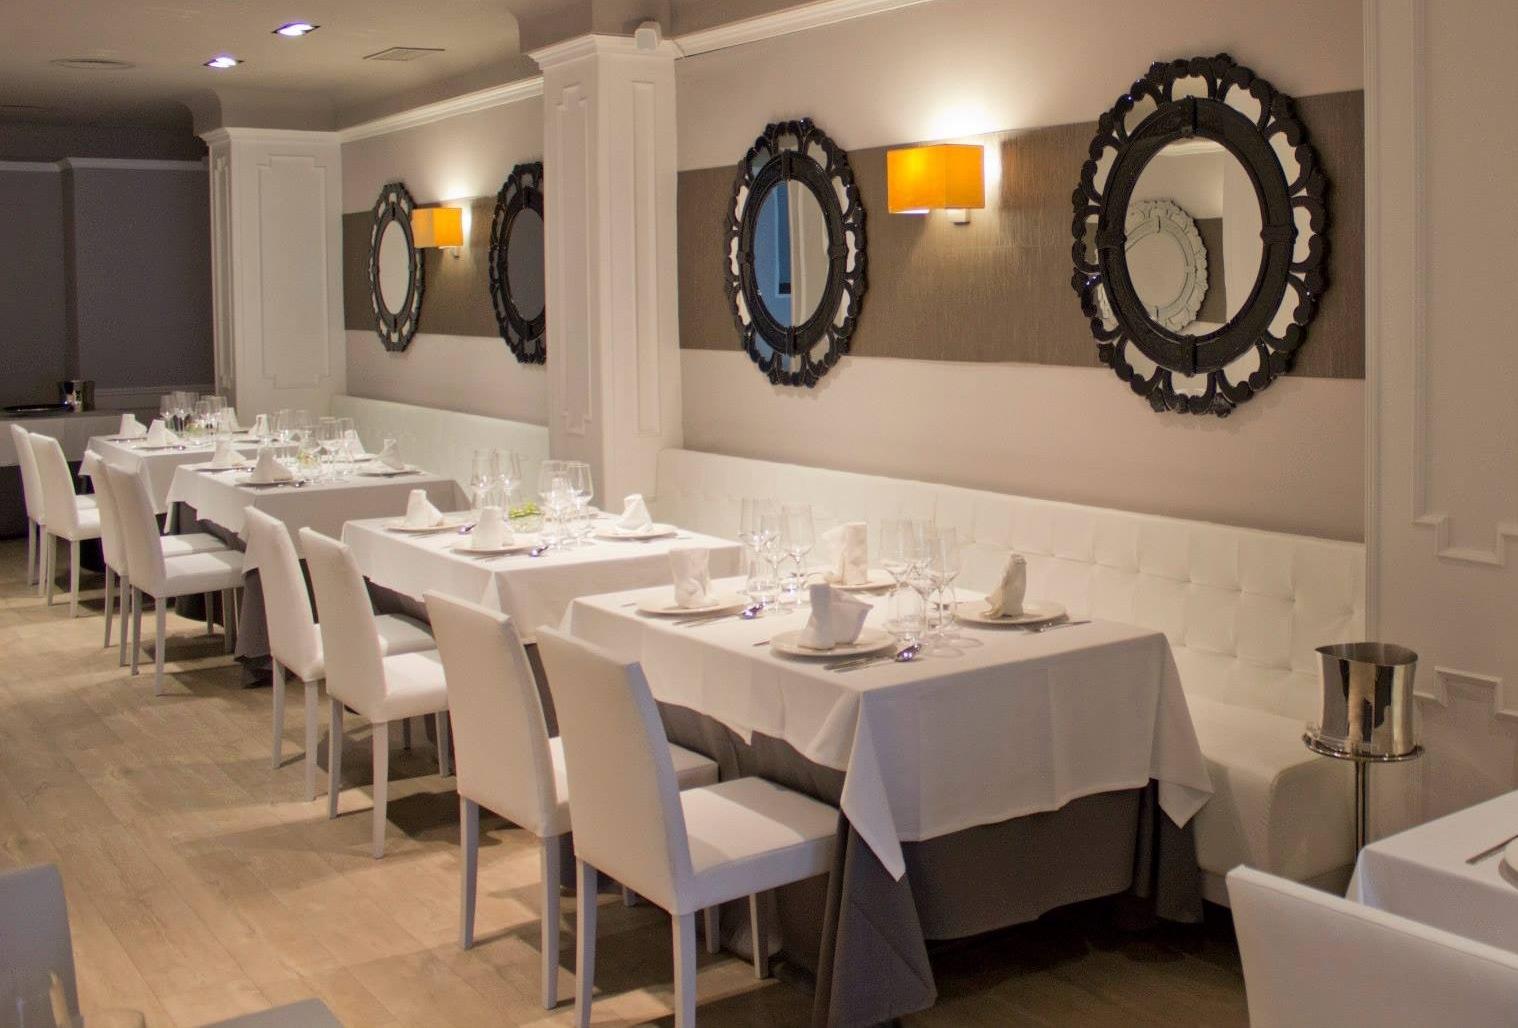 Restaurante para Celebraciones en Valencia .- Nou Gourme